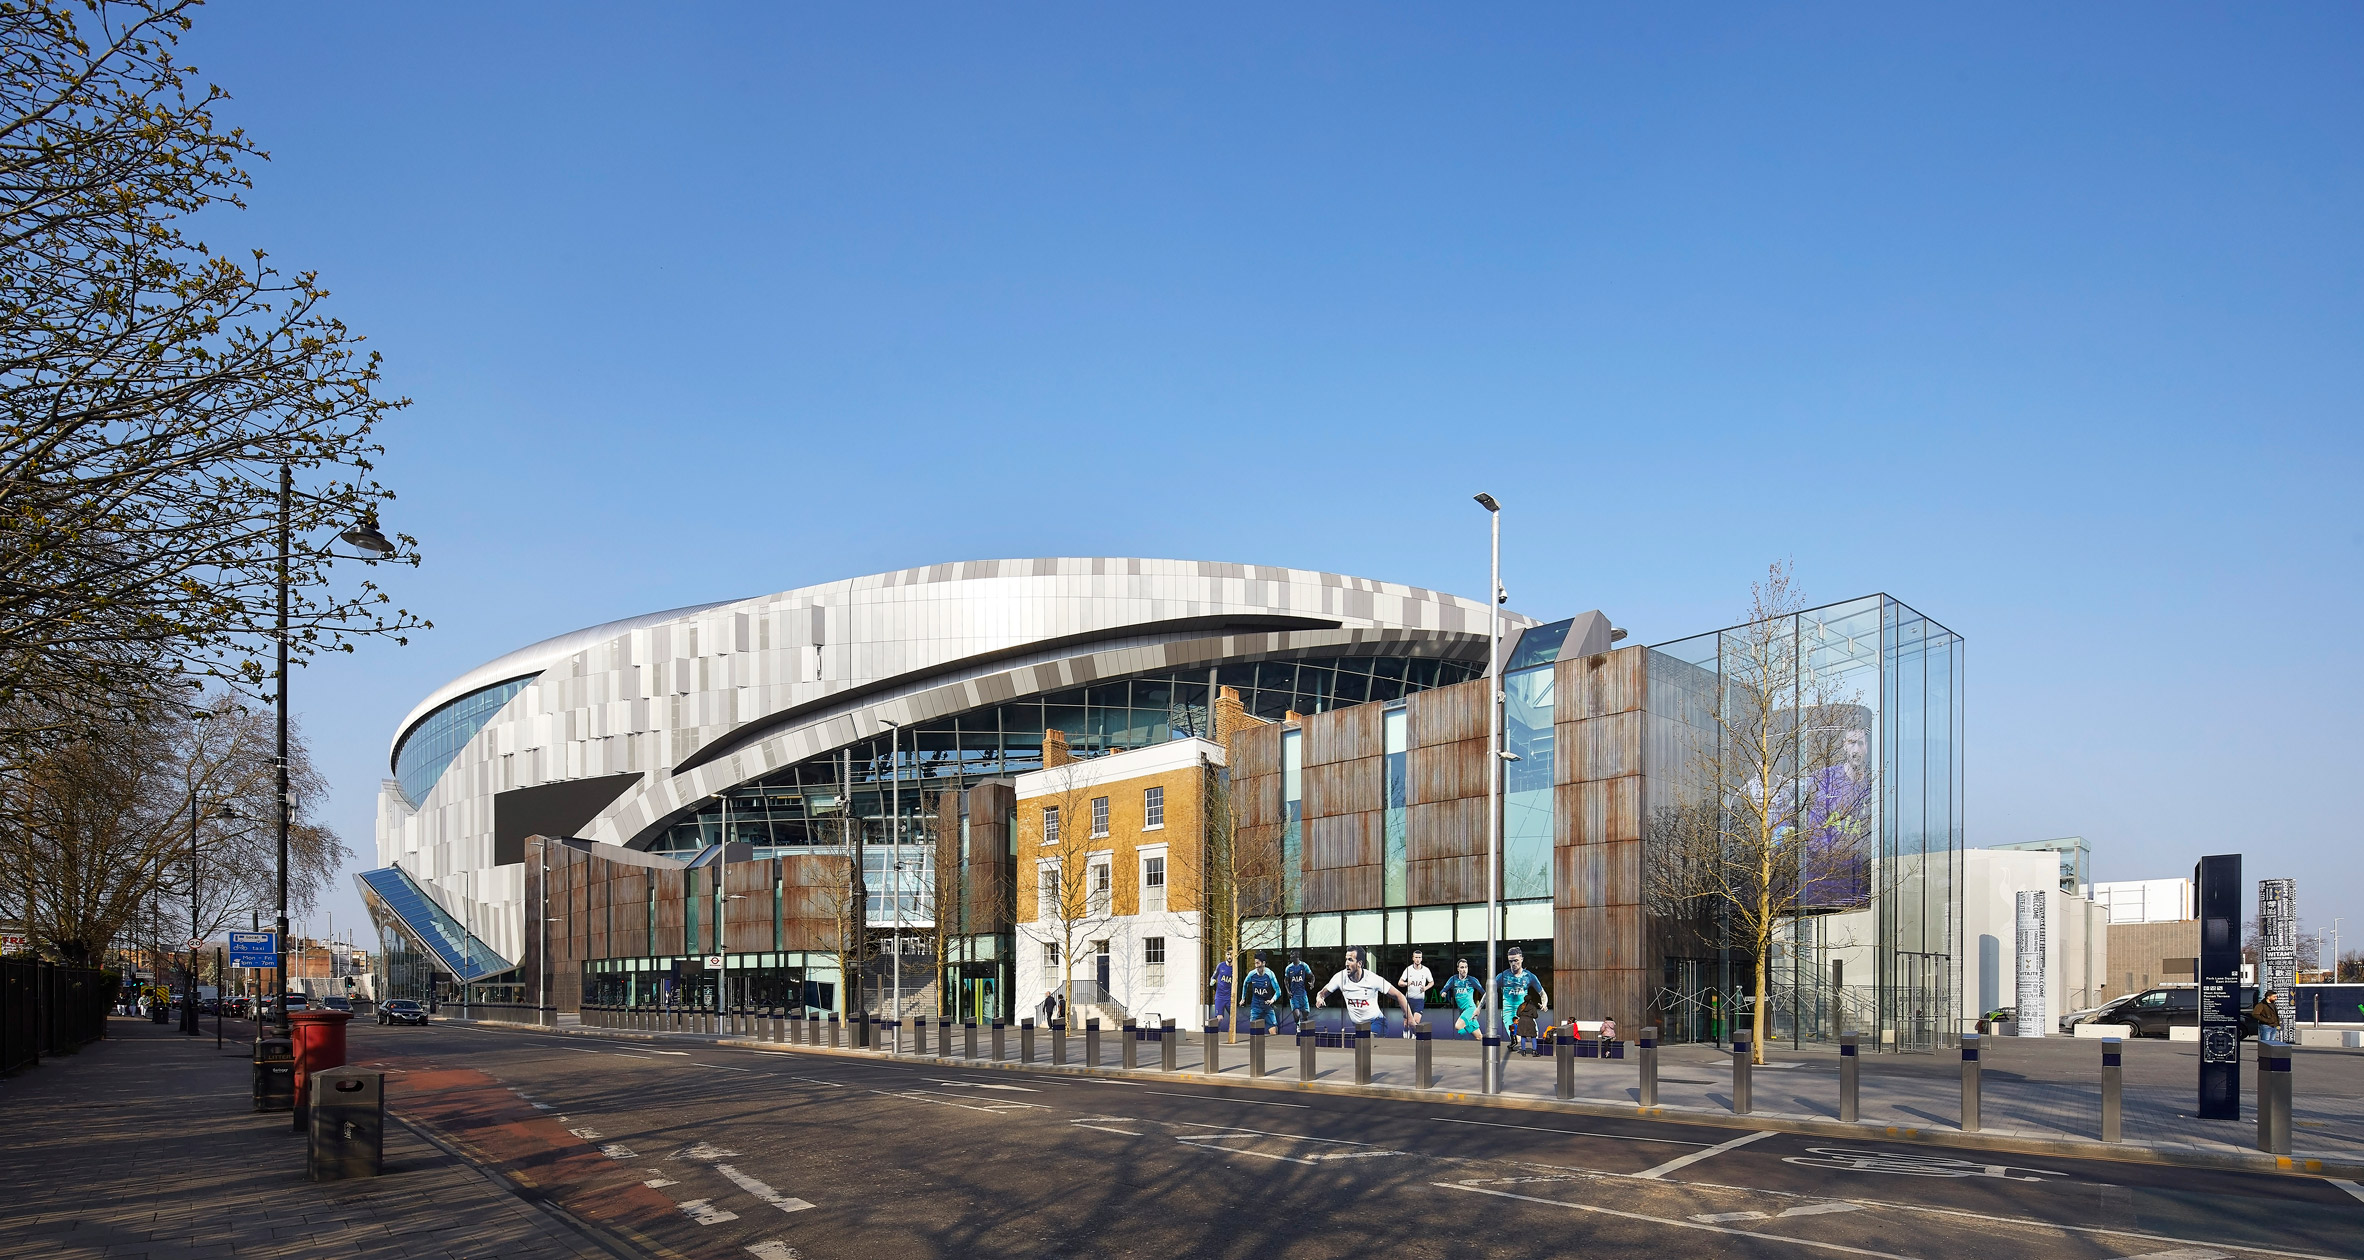 Tottenham Hotspur Stadium in London by Populous